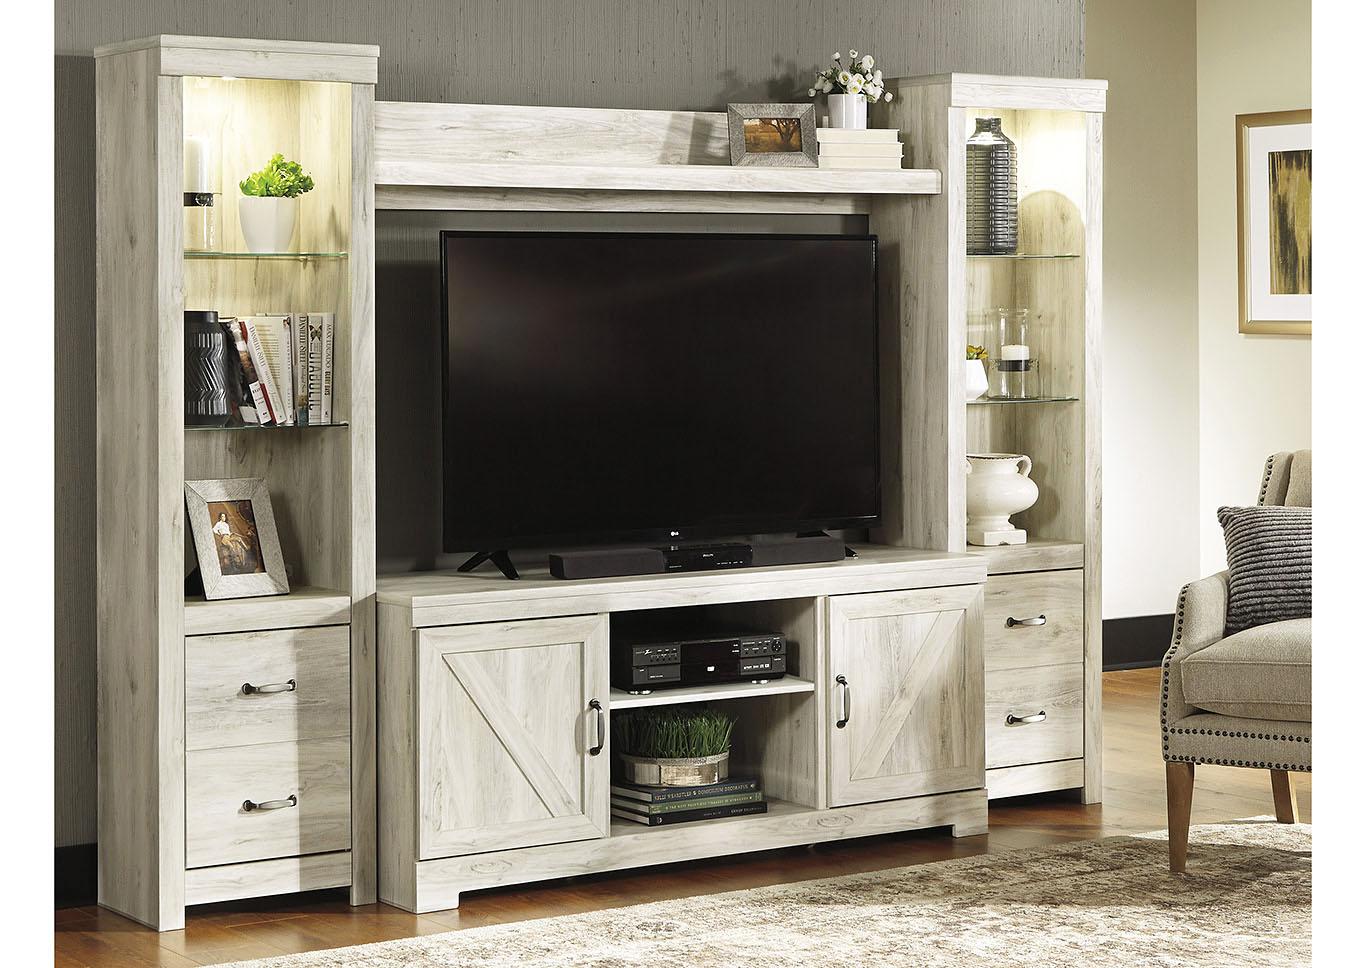 Bellaby Whitewash Entertainment Center Best Buy Furniture and Mattress